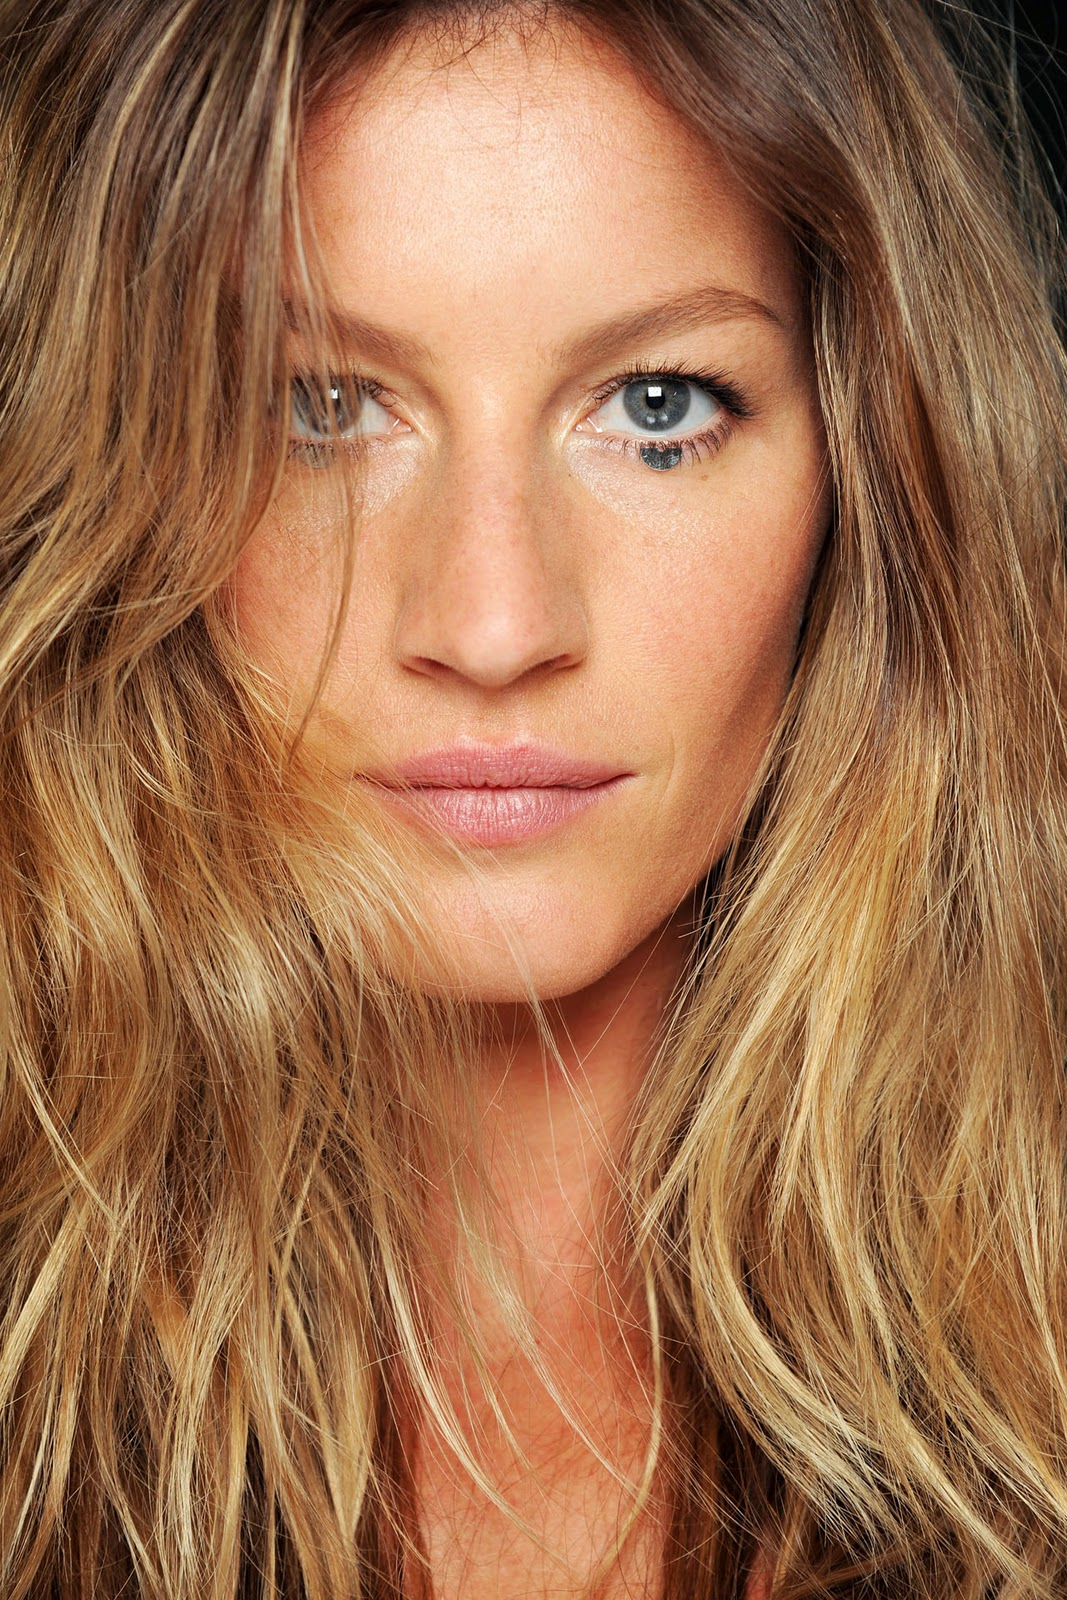 Gisele Bundchen (Givenchy S/S 2012) HQ +backstage - Models ... Gisele Bundchen